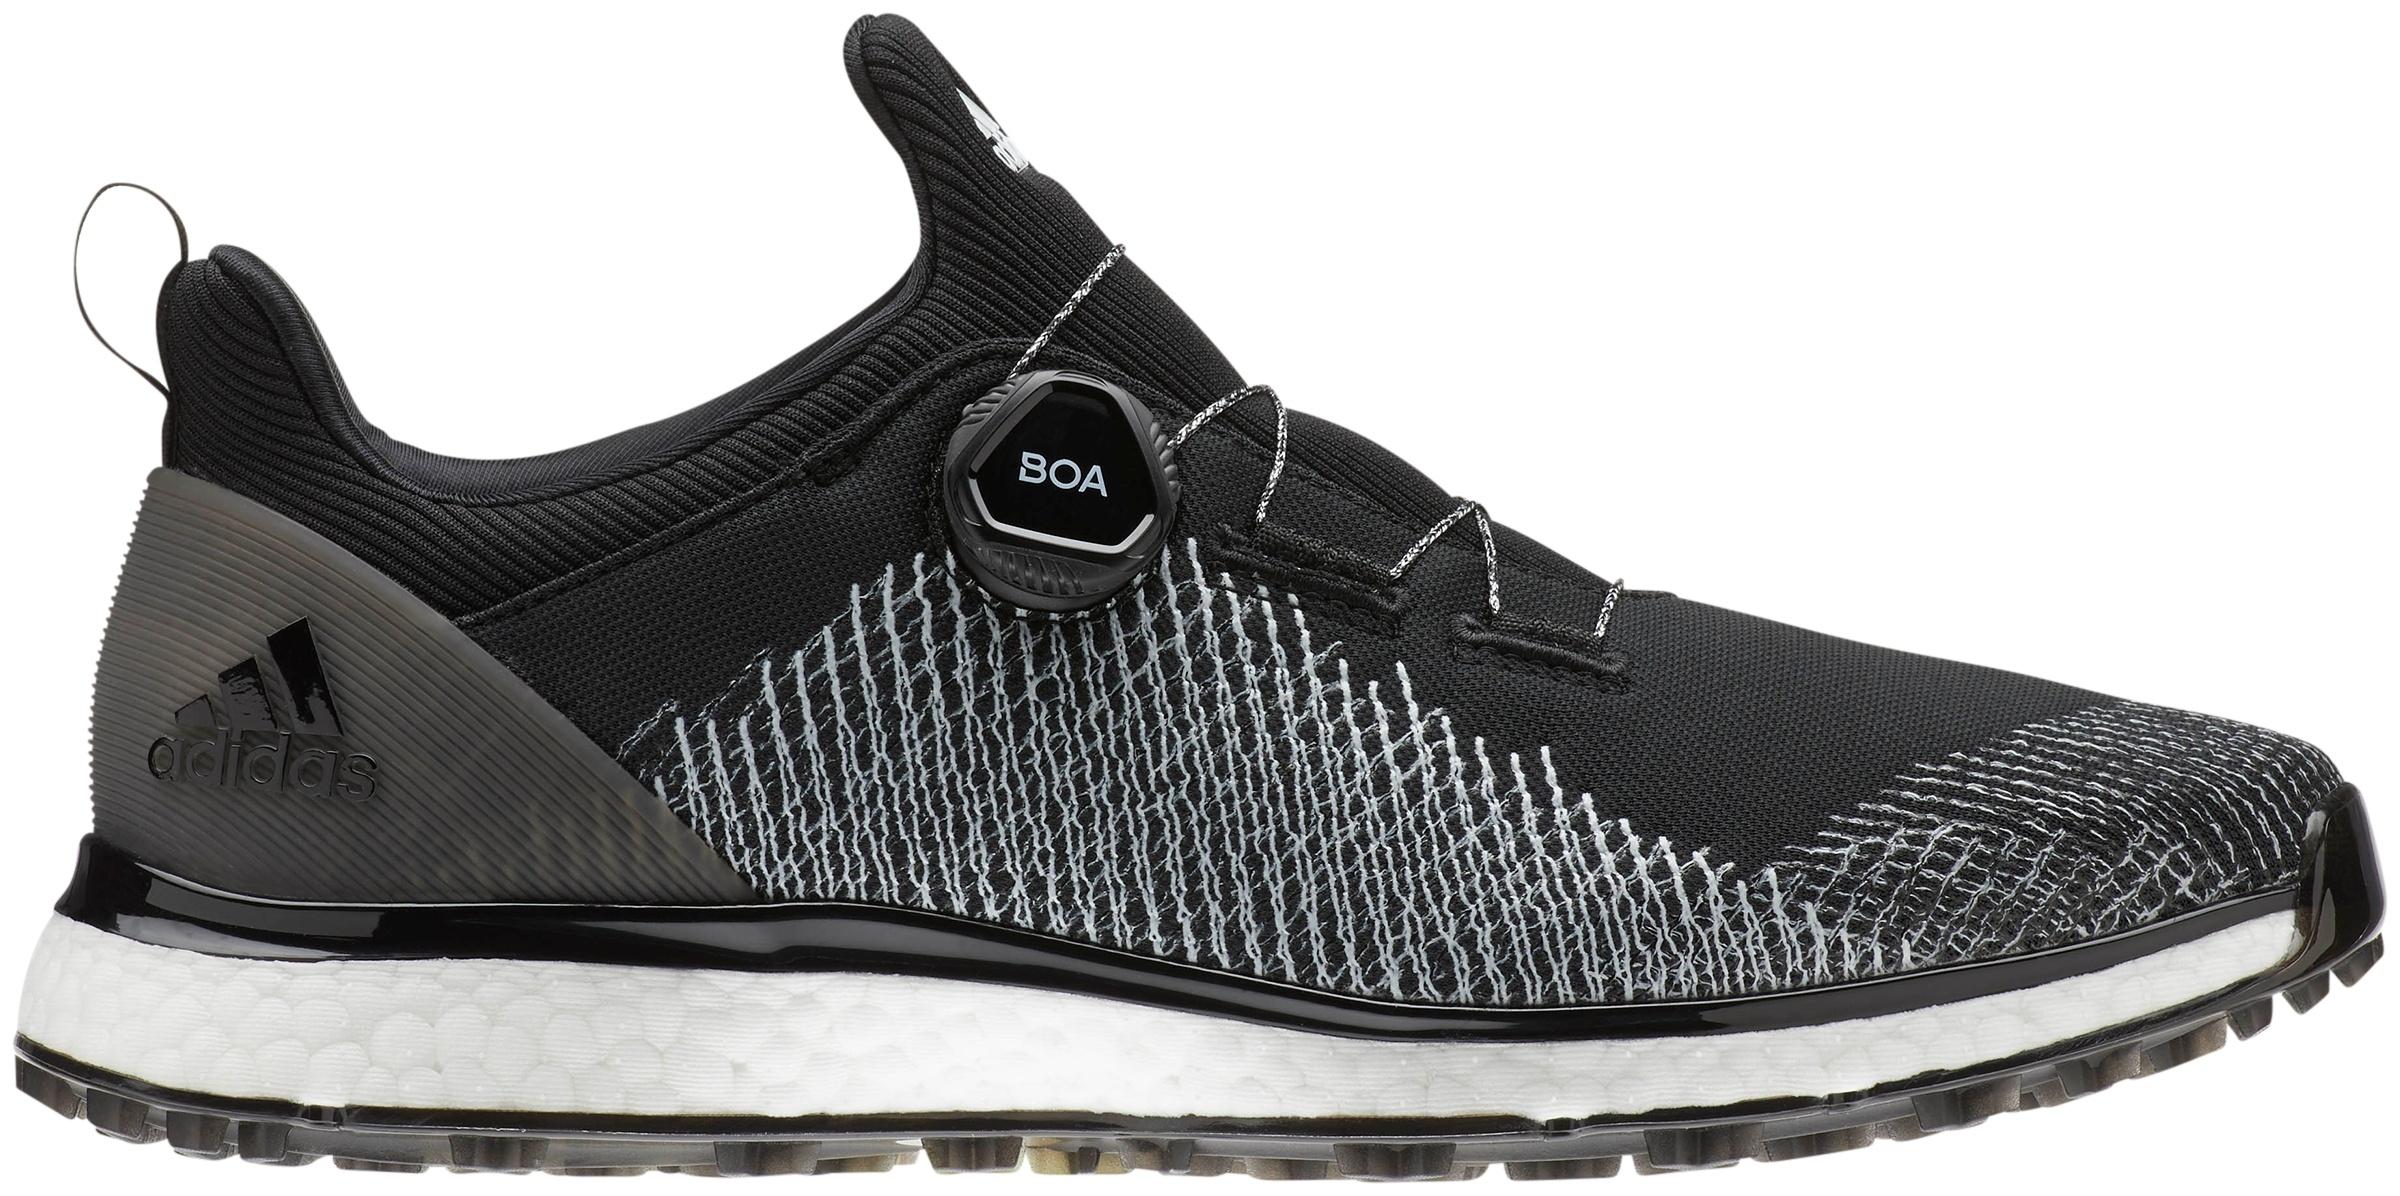 302c684cc5e8 Adidas Forgefiber BOA Shoes